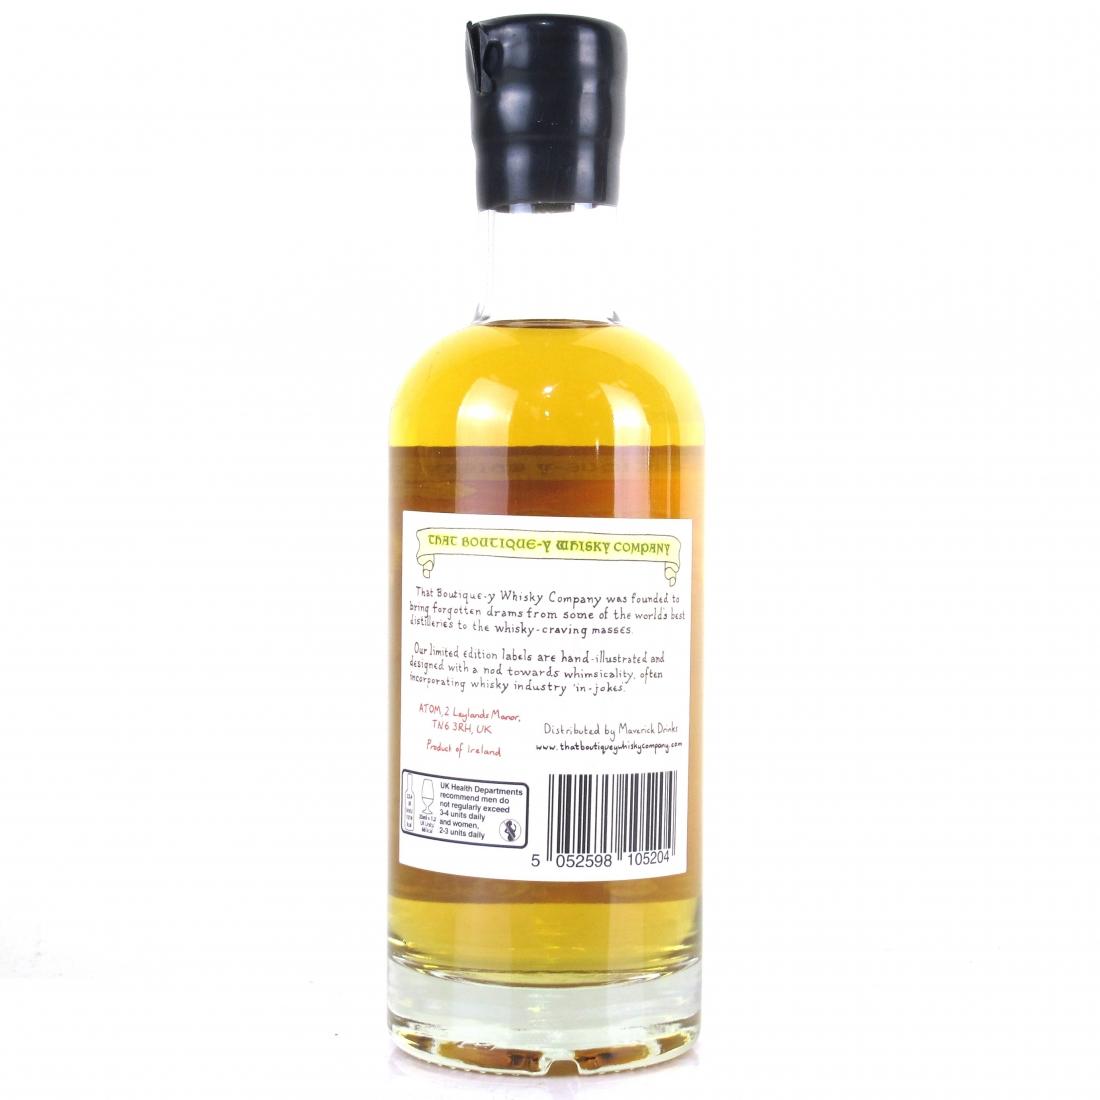 Irish Single Malt #1 That Boutique-Y Whisky Company 24 Year Old Batch #1